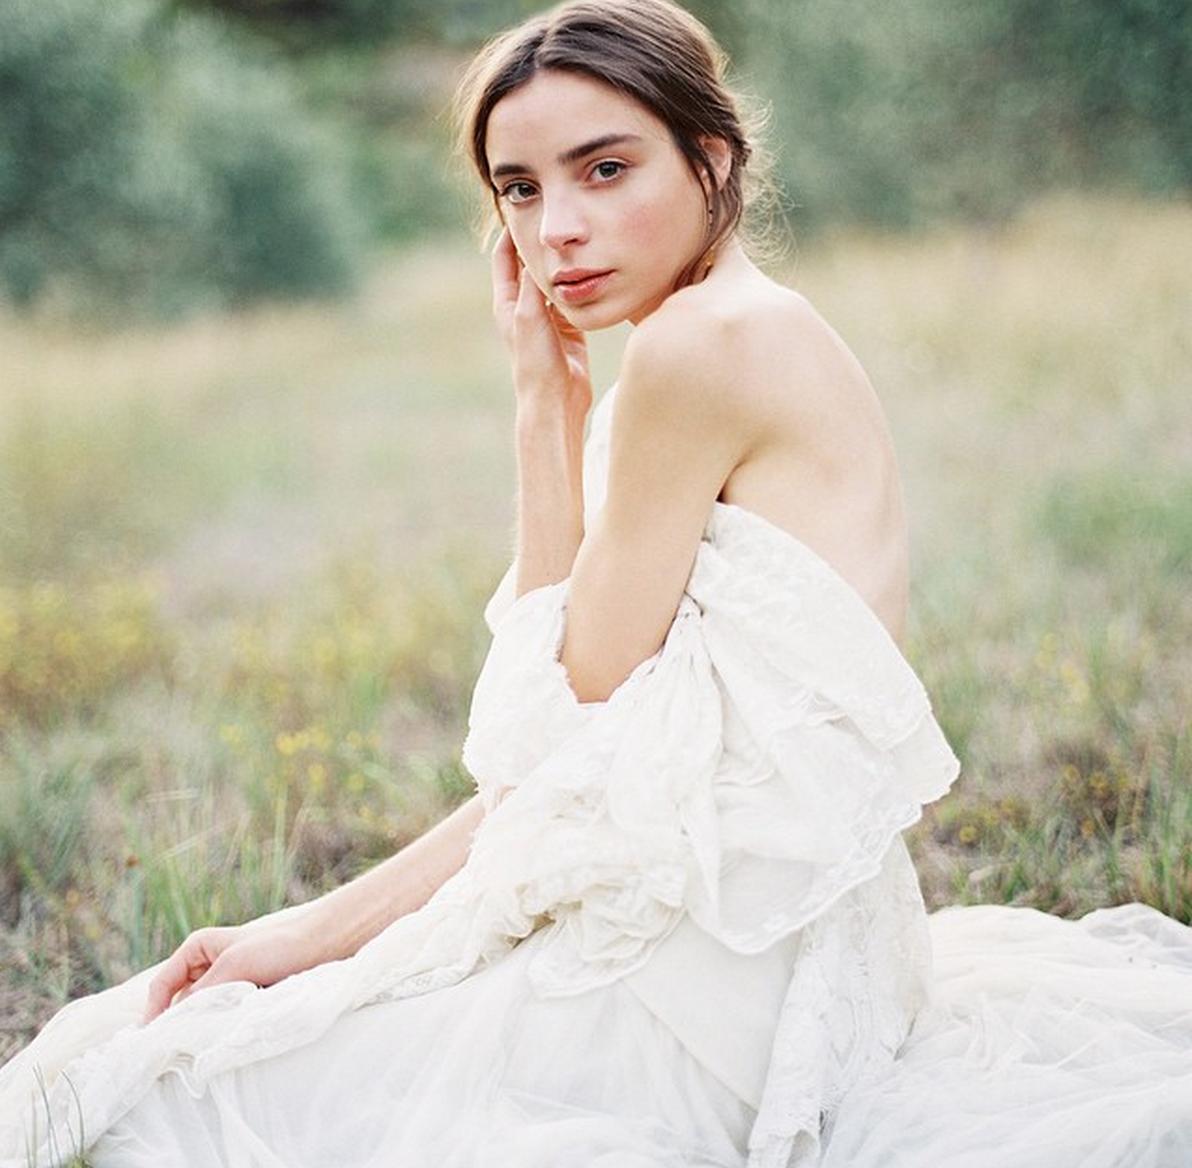 Pin by Ellary Larson on Photoshoot ideas Bridal boudoir